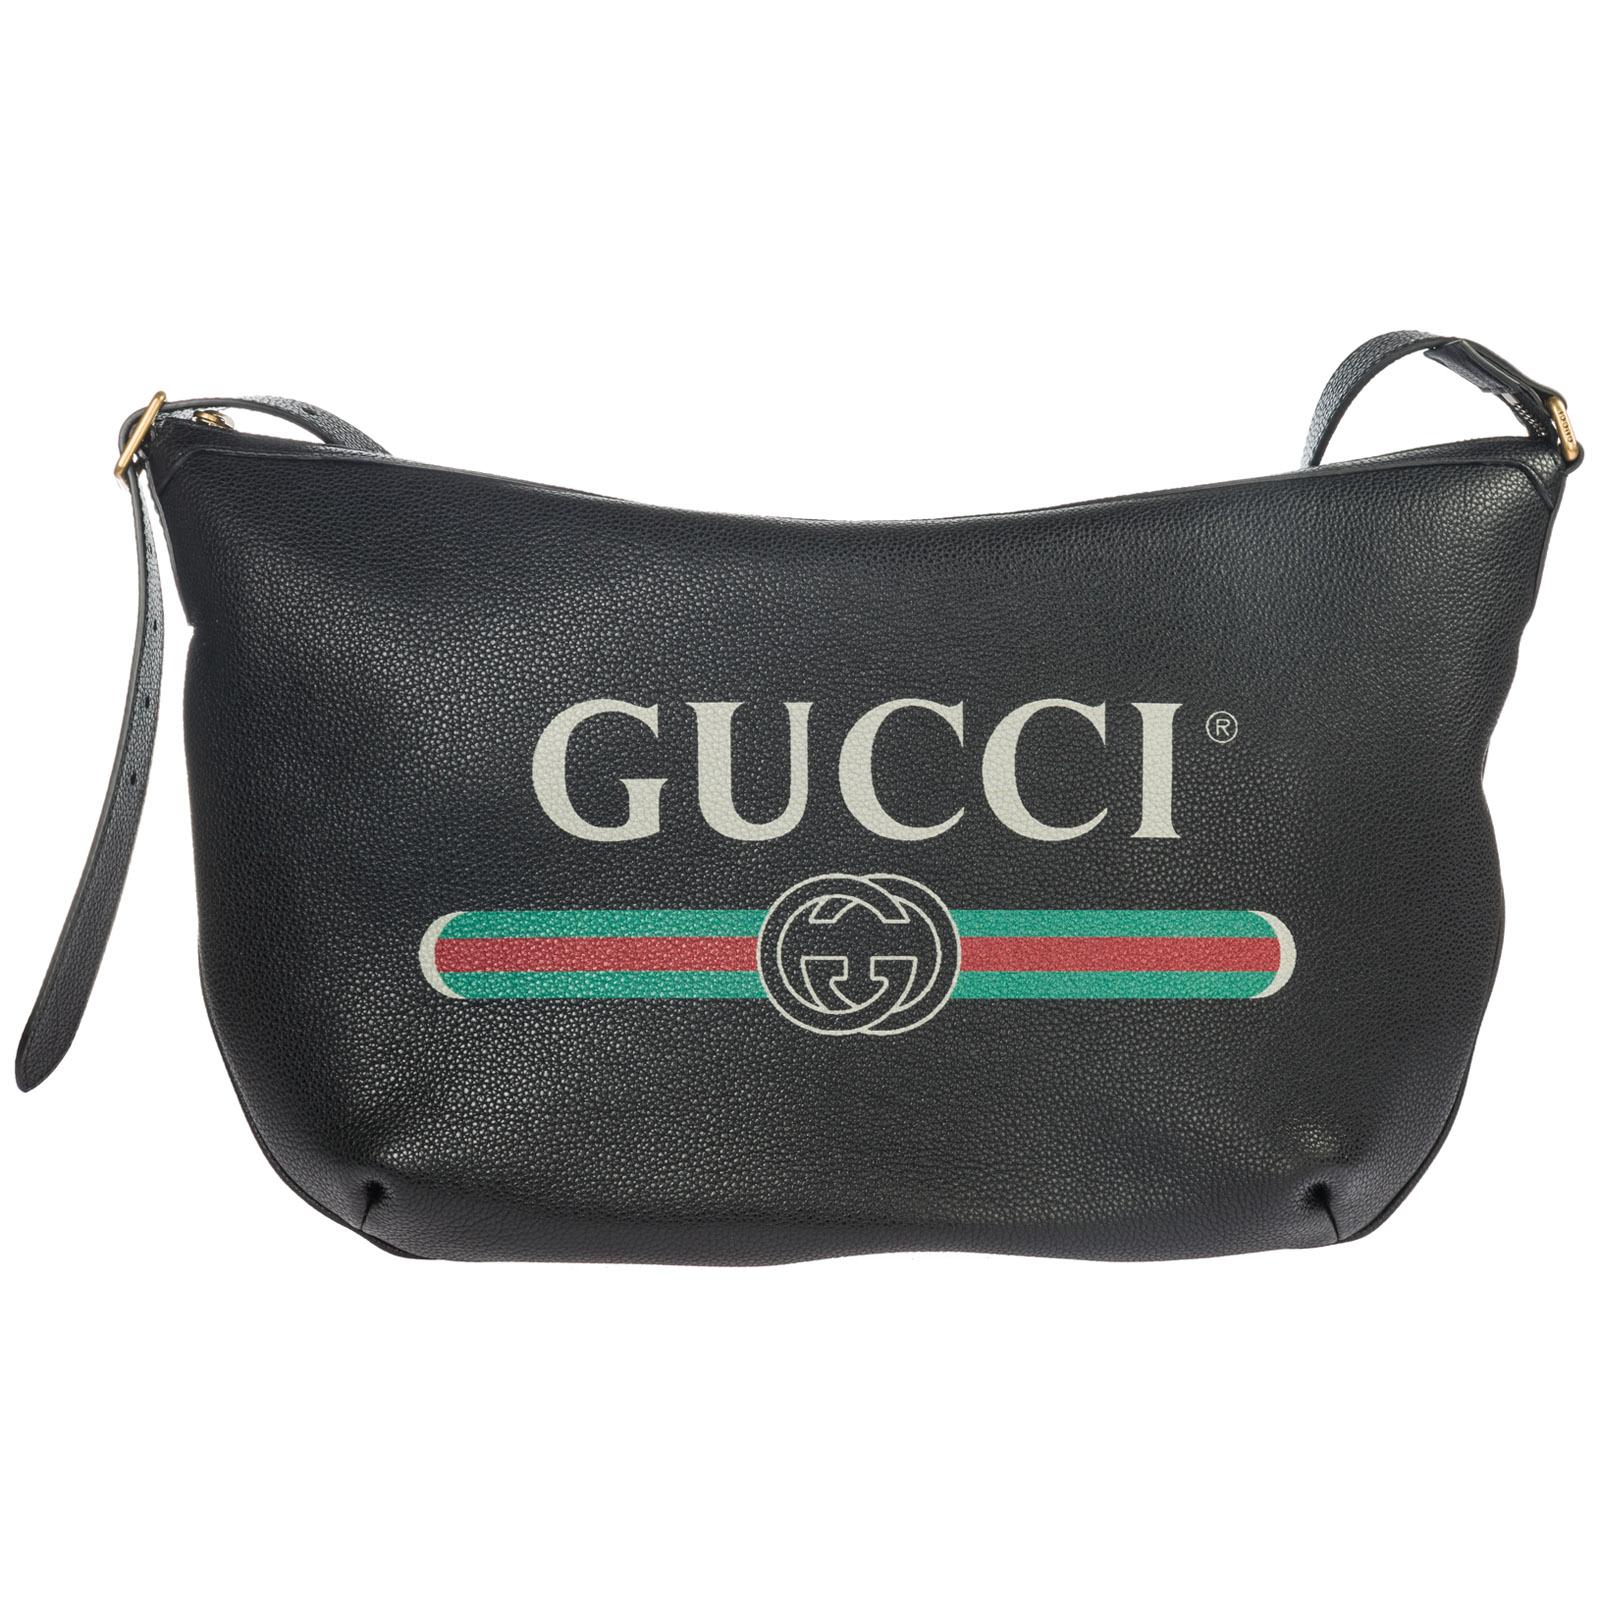 5efd7303e75 Gucci Women s leather cross-body messenger shoulder bag gucci print